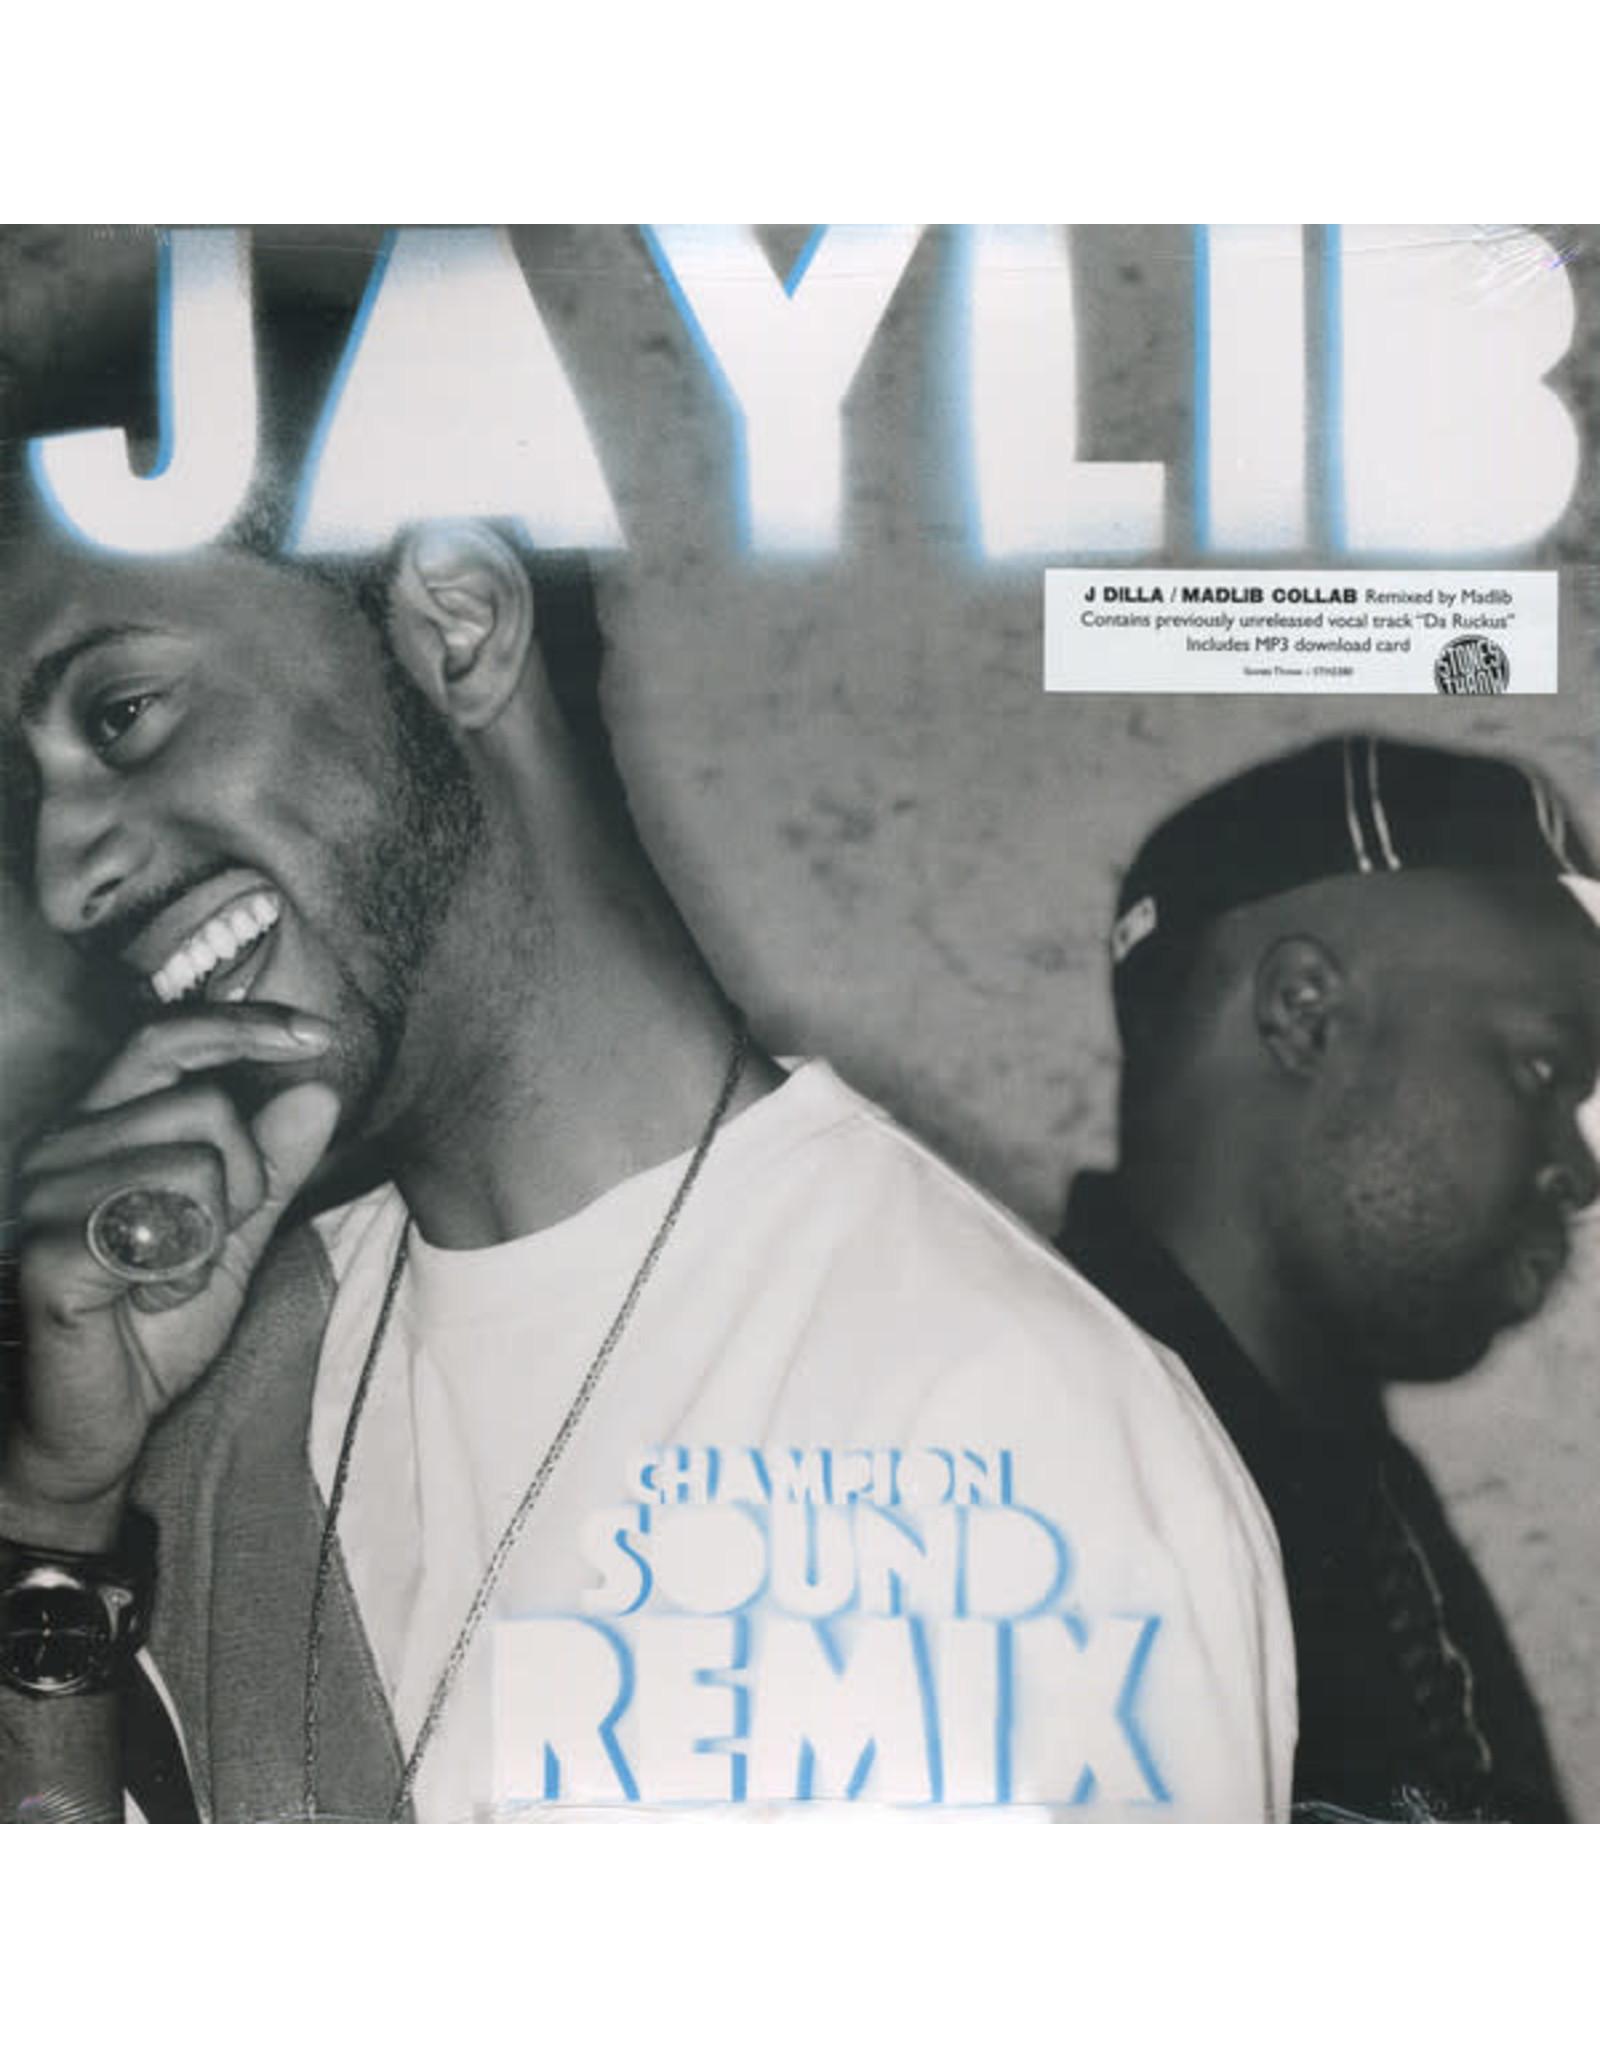 Jaylib - Champion Sound: The Remix LP